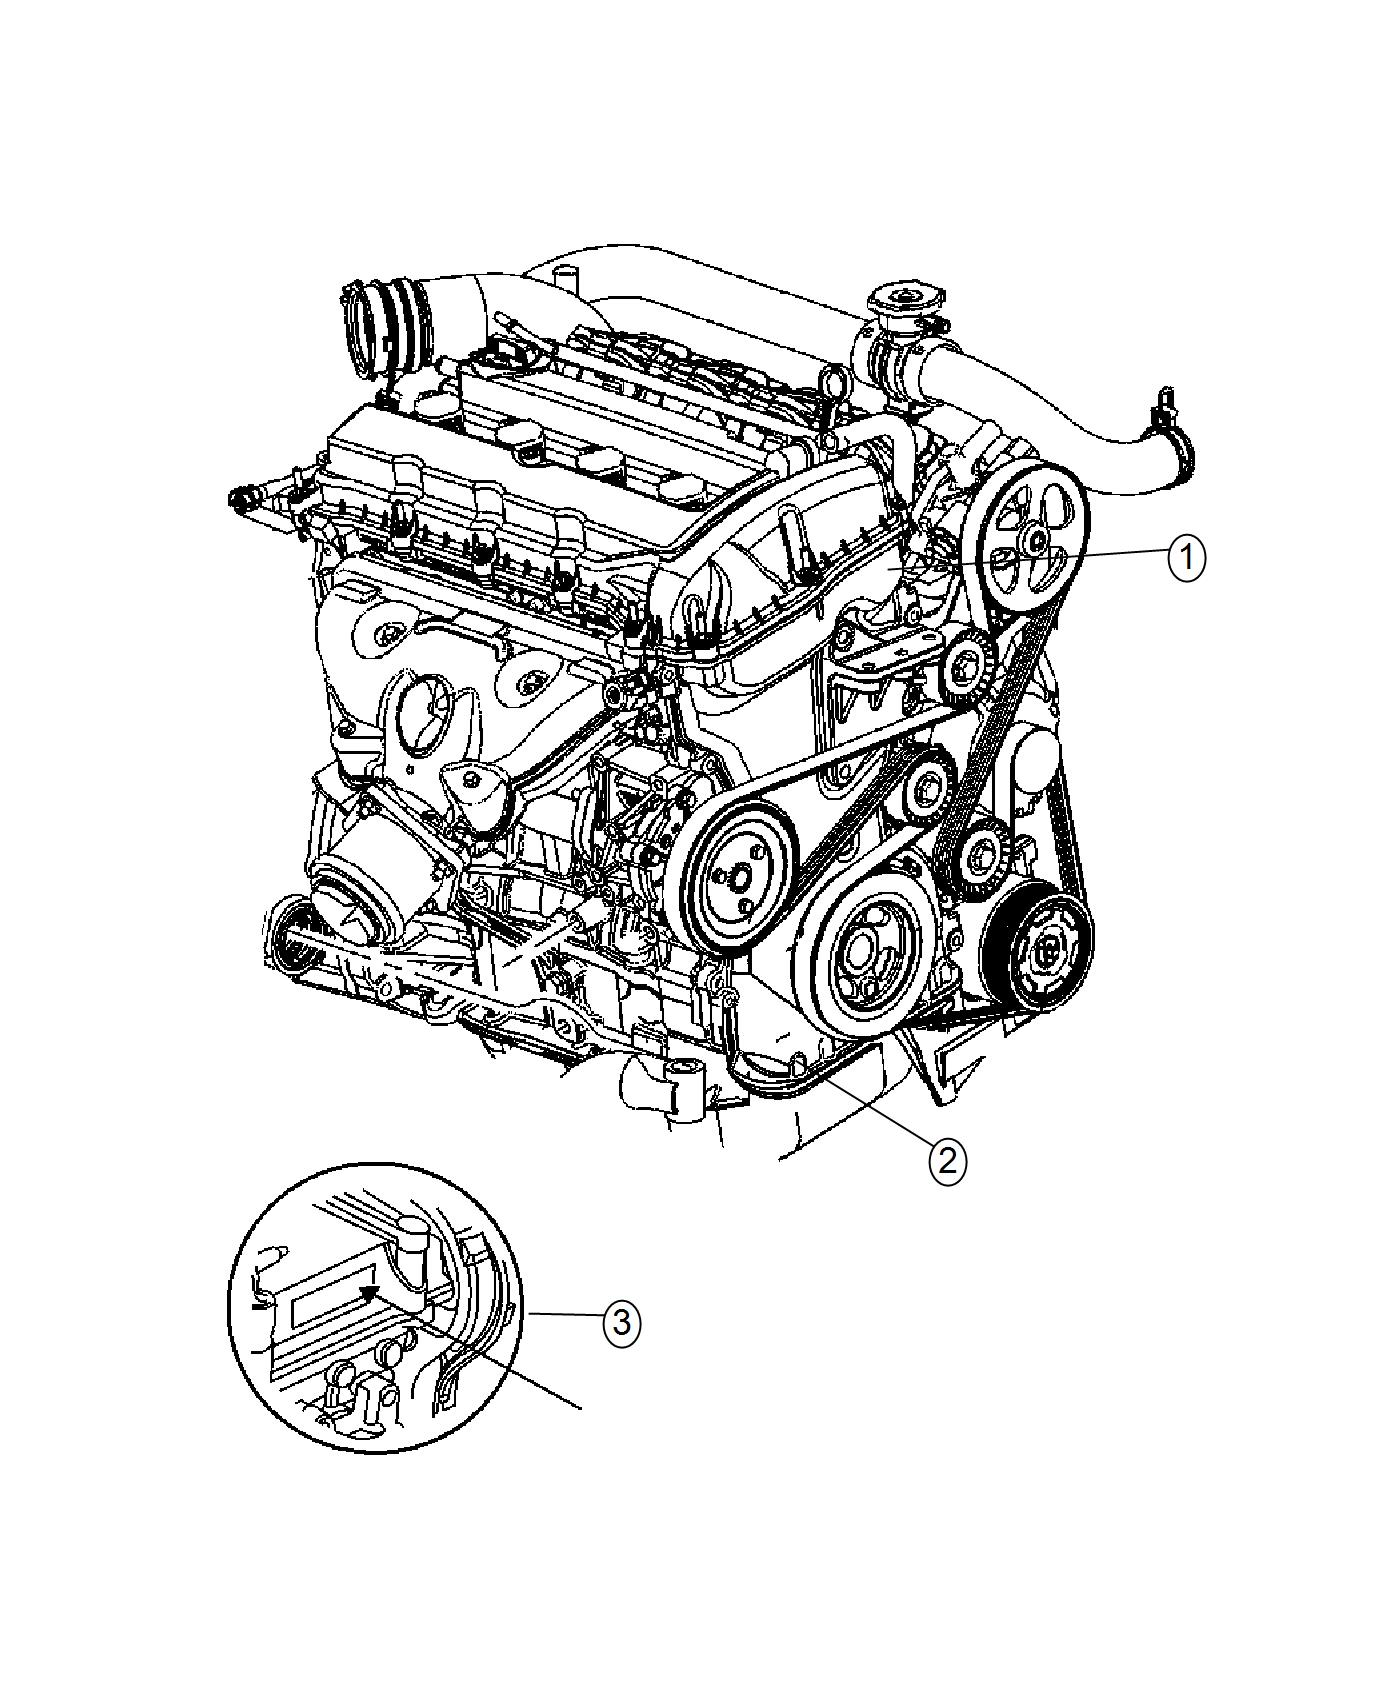 Jeep Renegade Engine Long Block 9 Spd 9hp48 Fwd Awd